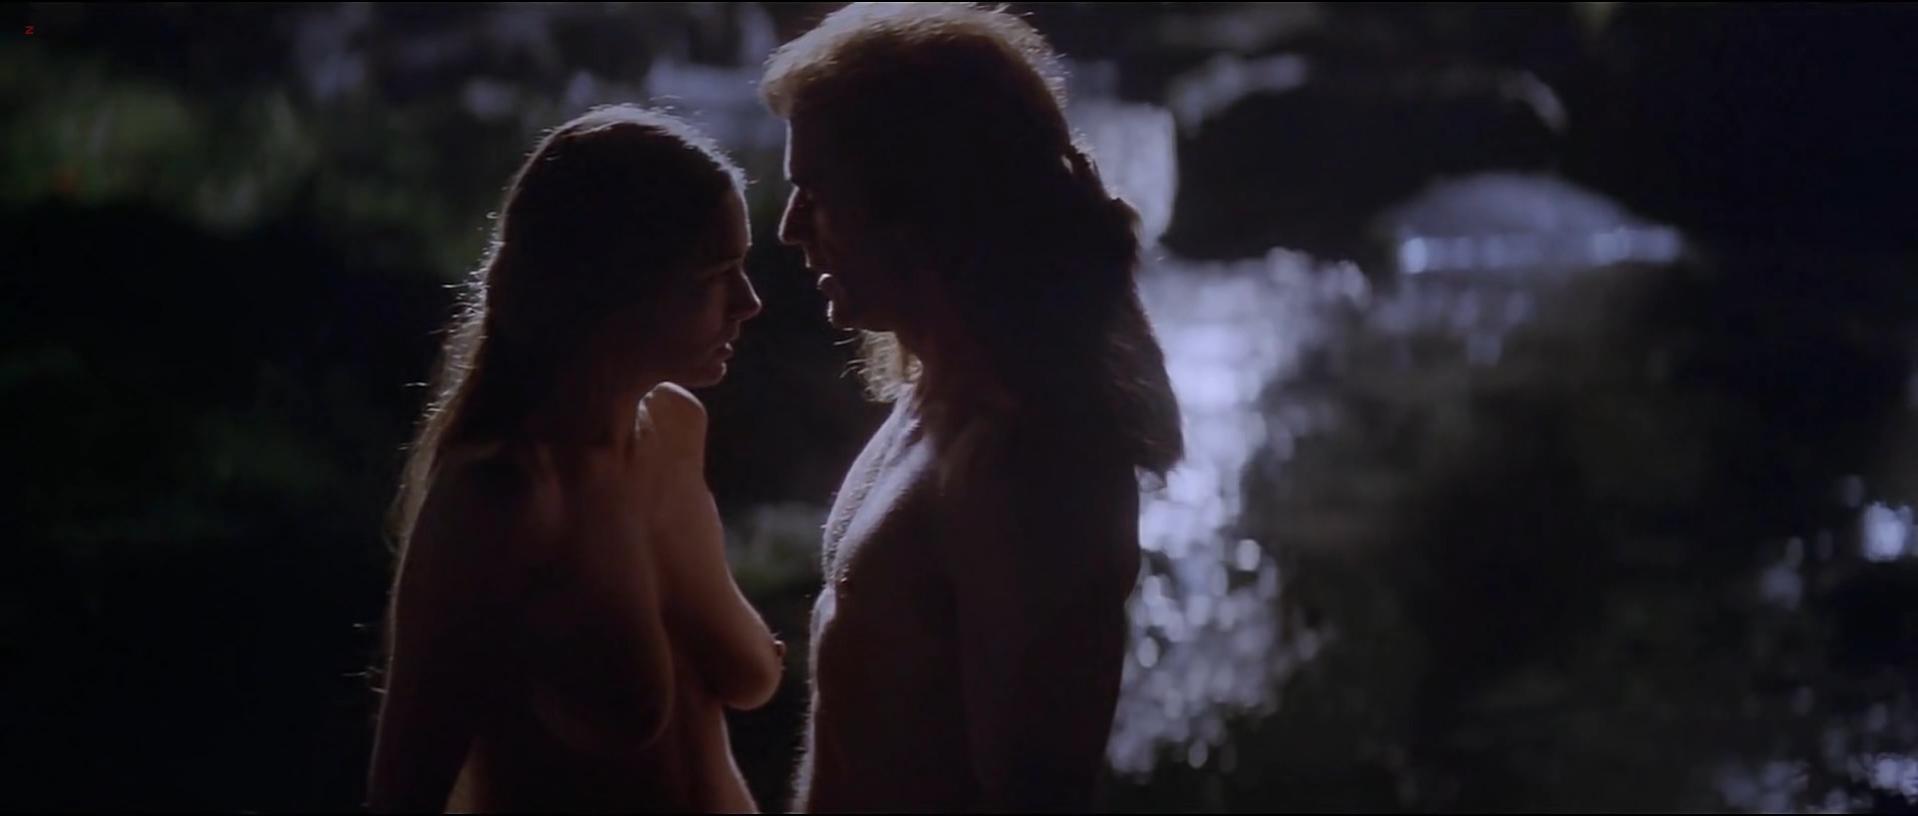 Catherine Mccormack Tits 23